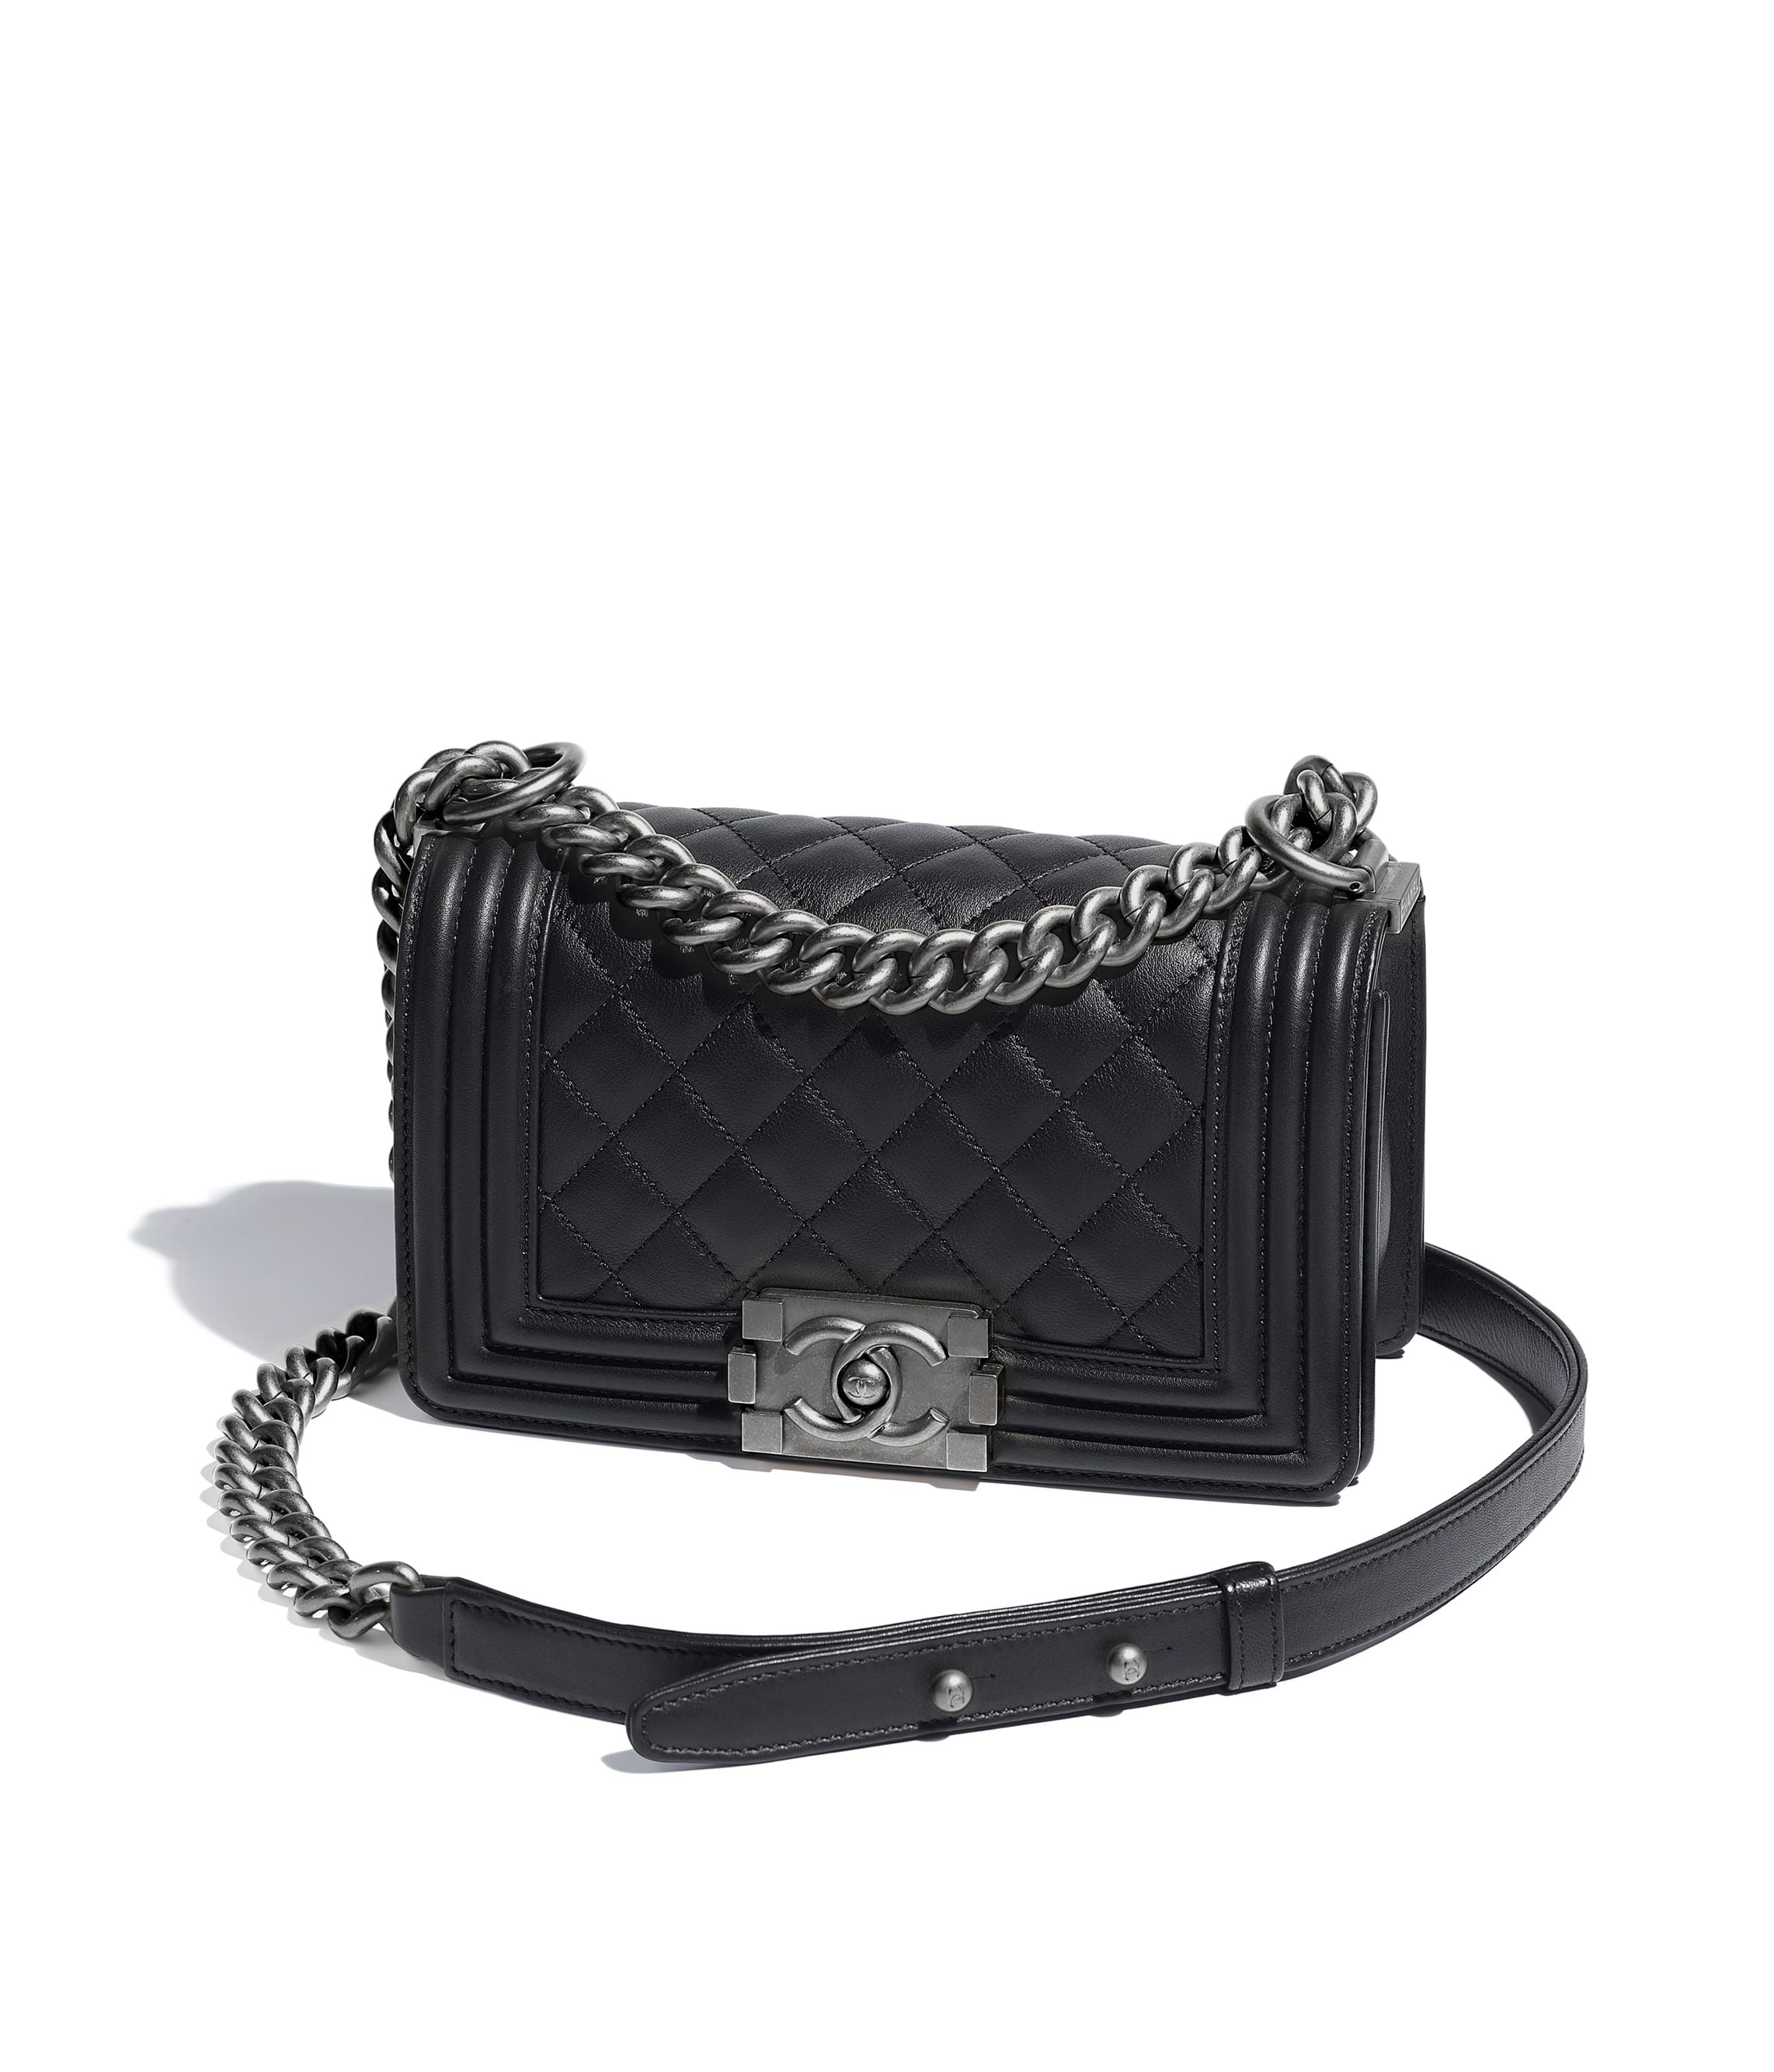 102f379a7 Small BOY CHANEL Handbag, calfskin & ruthenium-finish metal, black - CHANEL